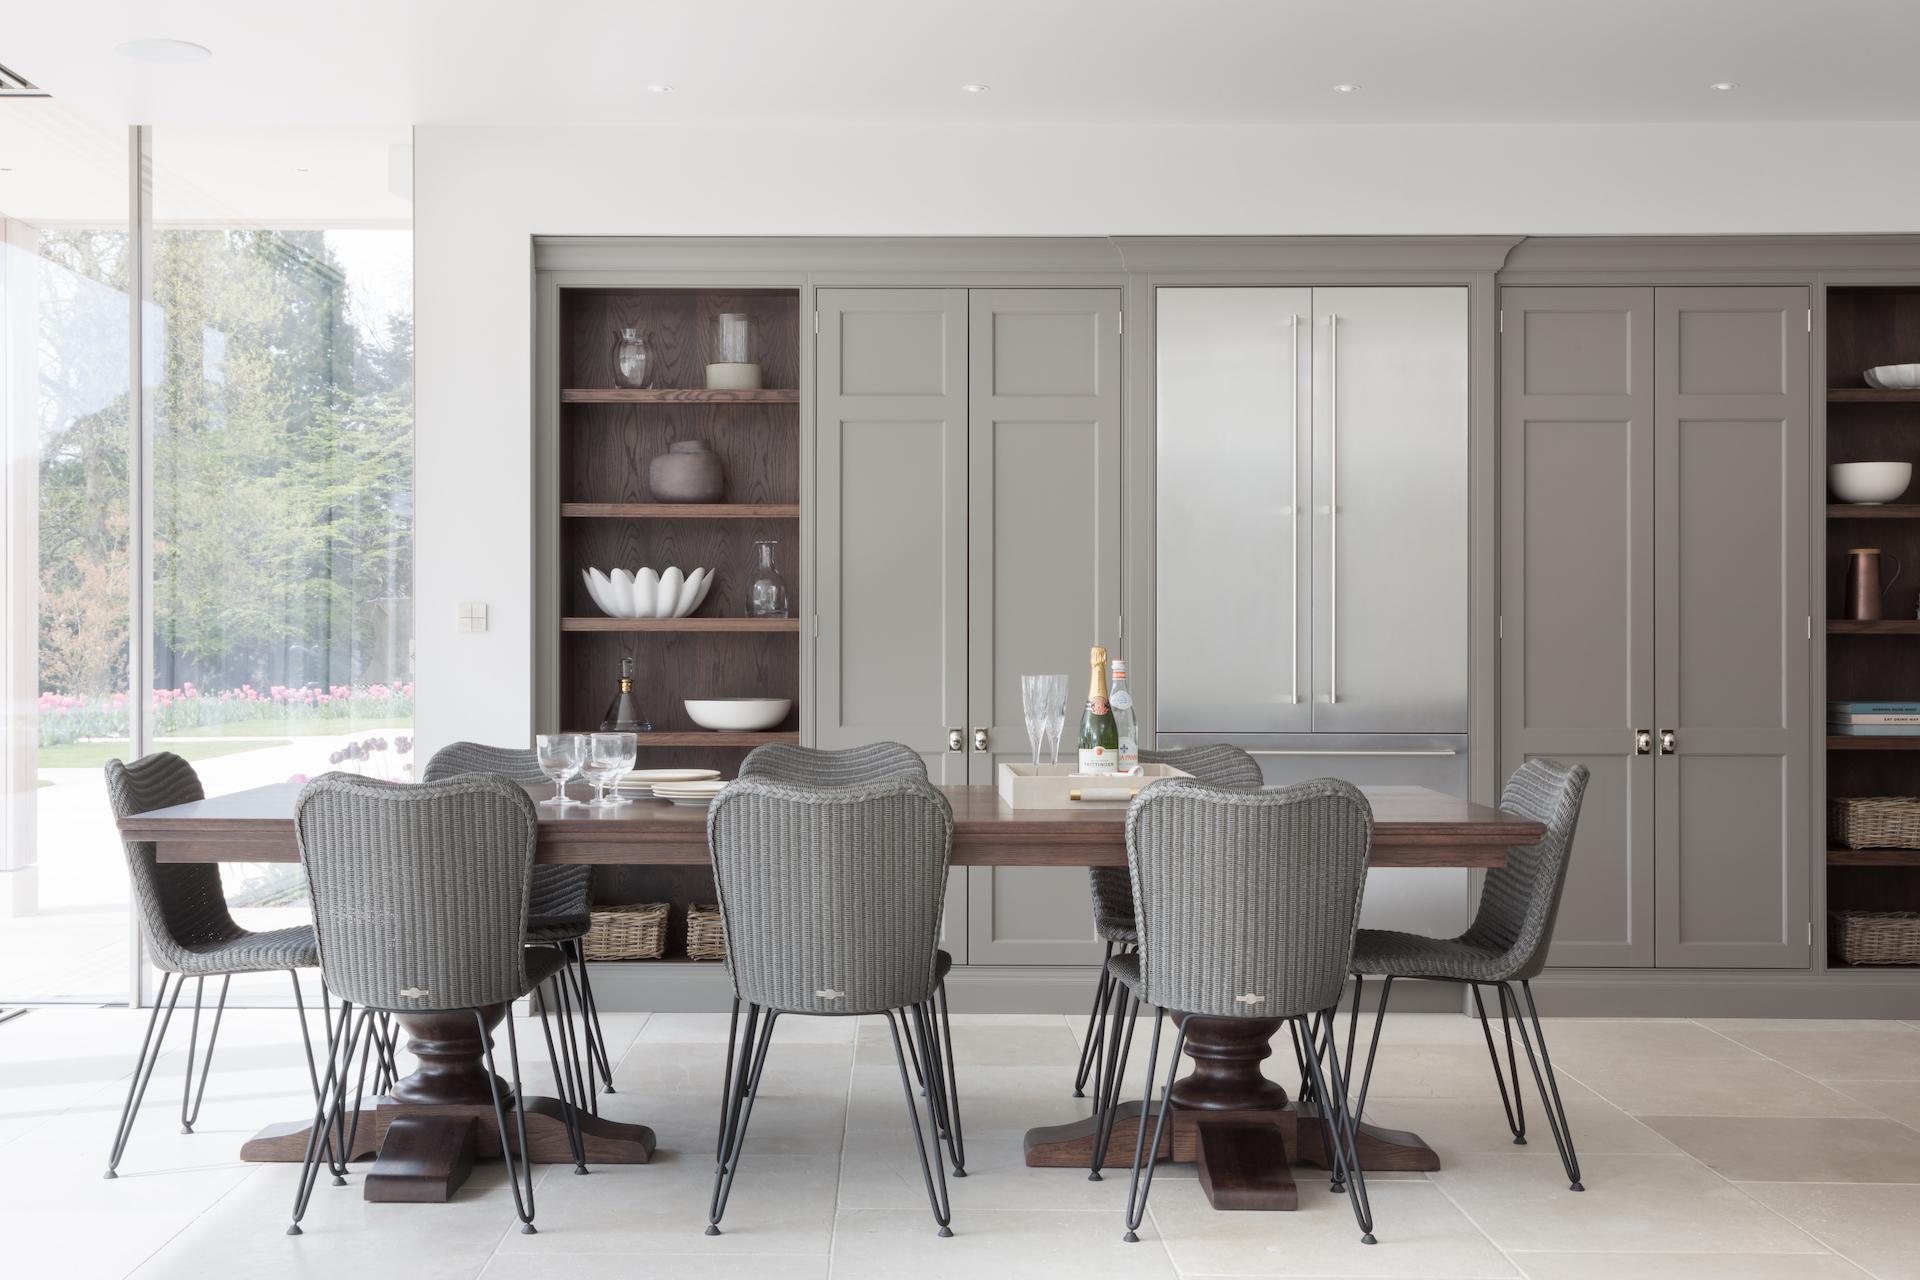 LuxeDeco   Think Big, Shop Small - Interiors - Humphrey Munson Blog